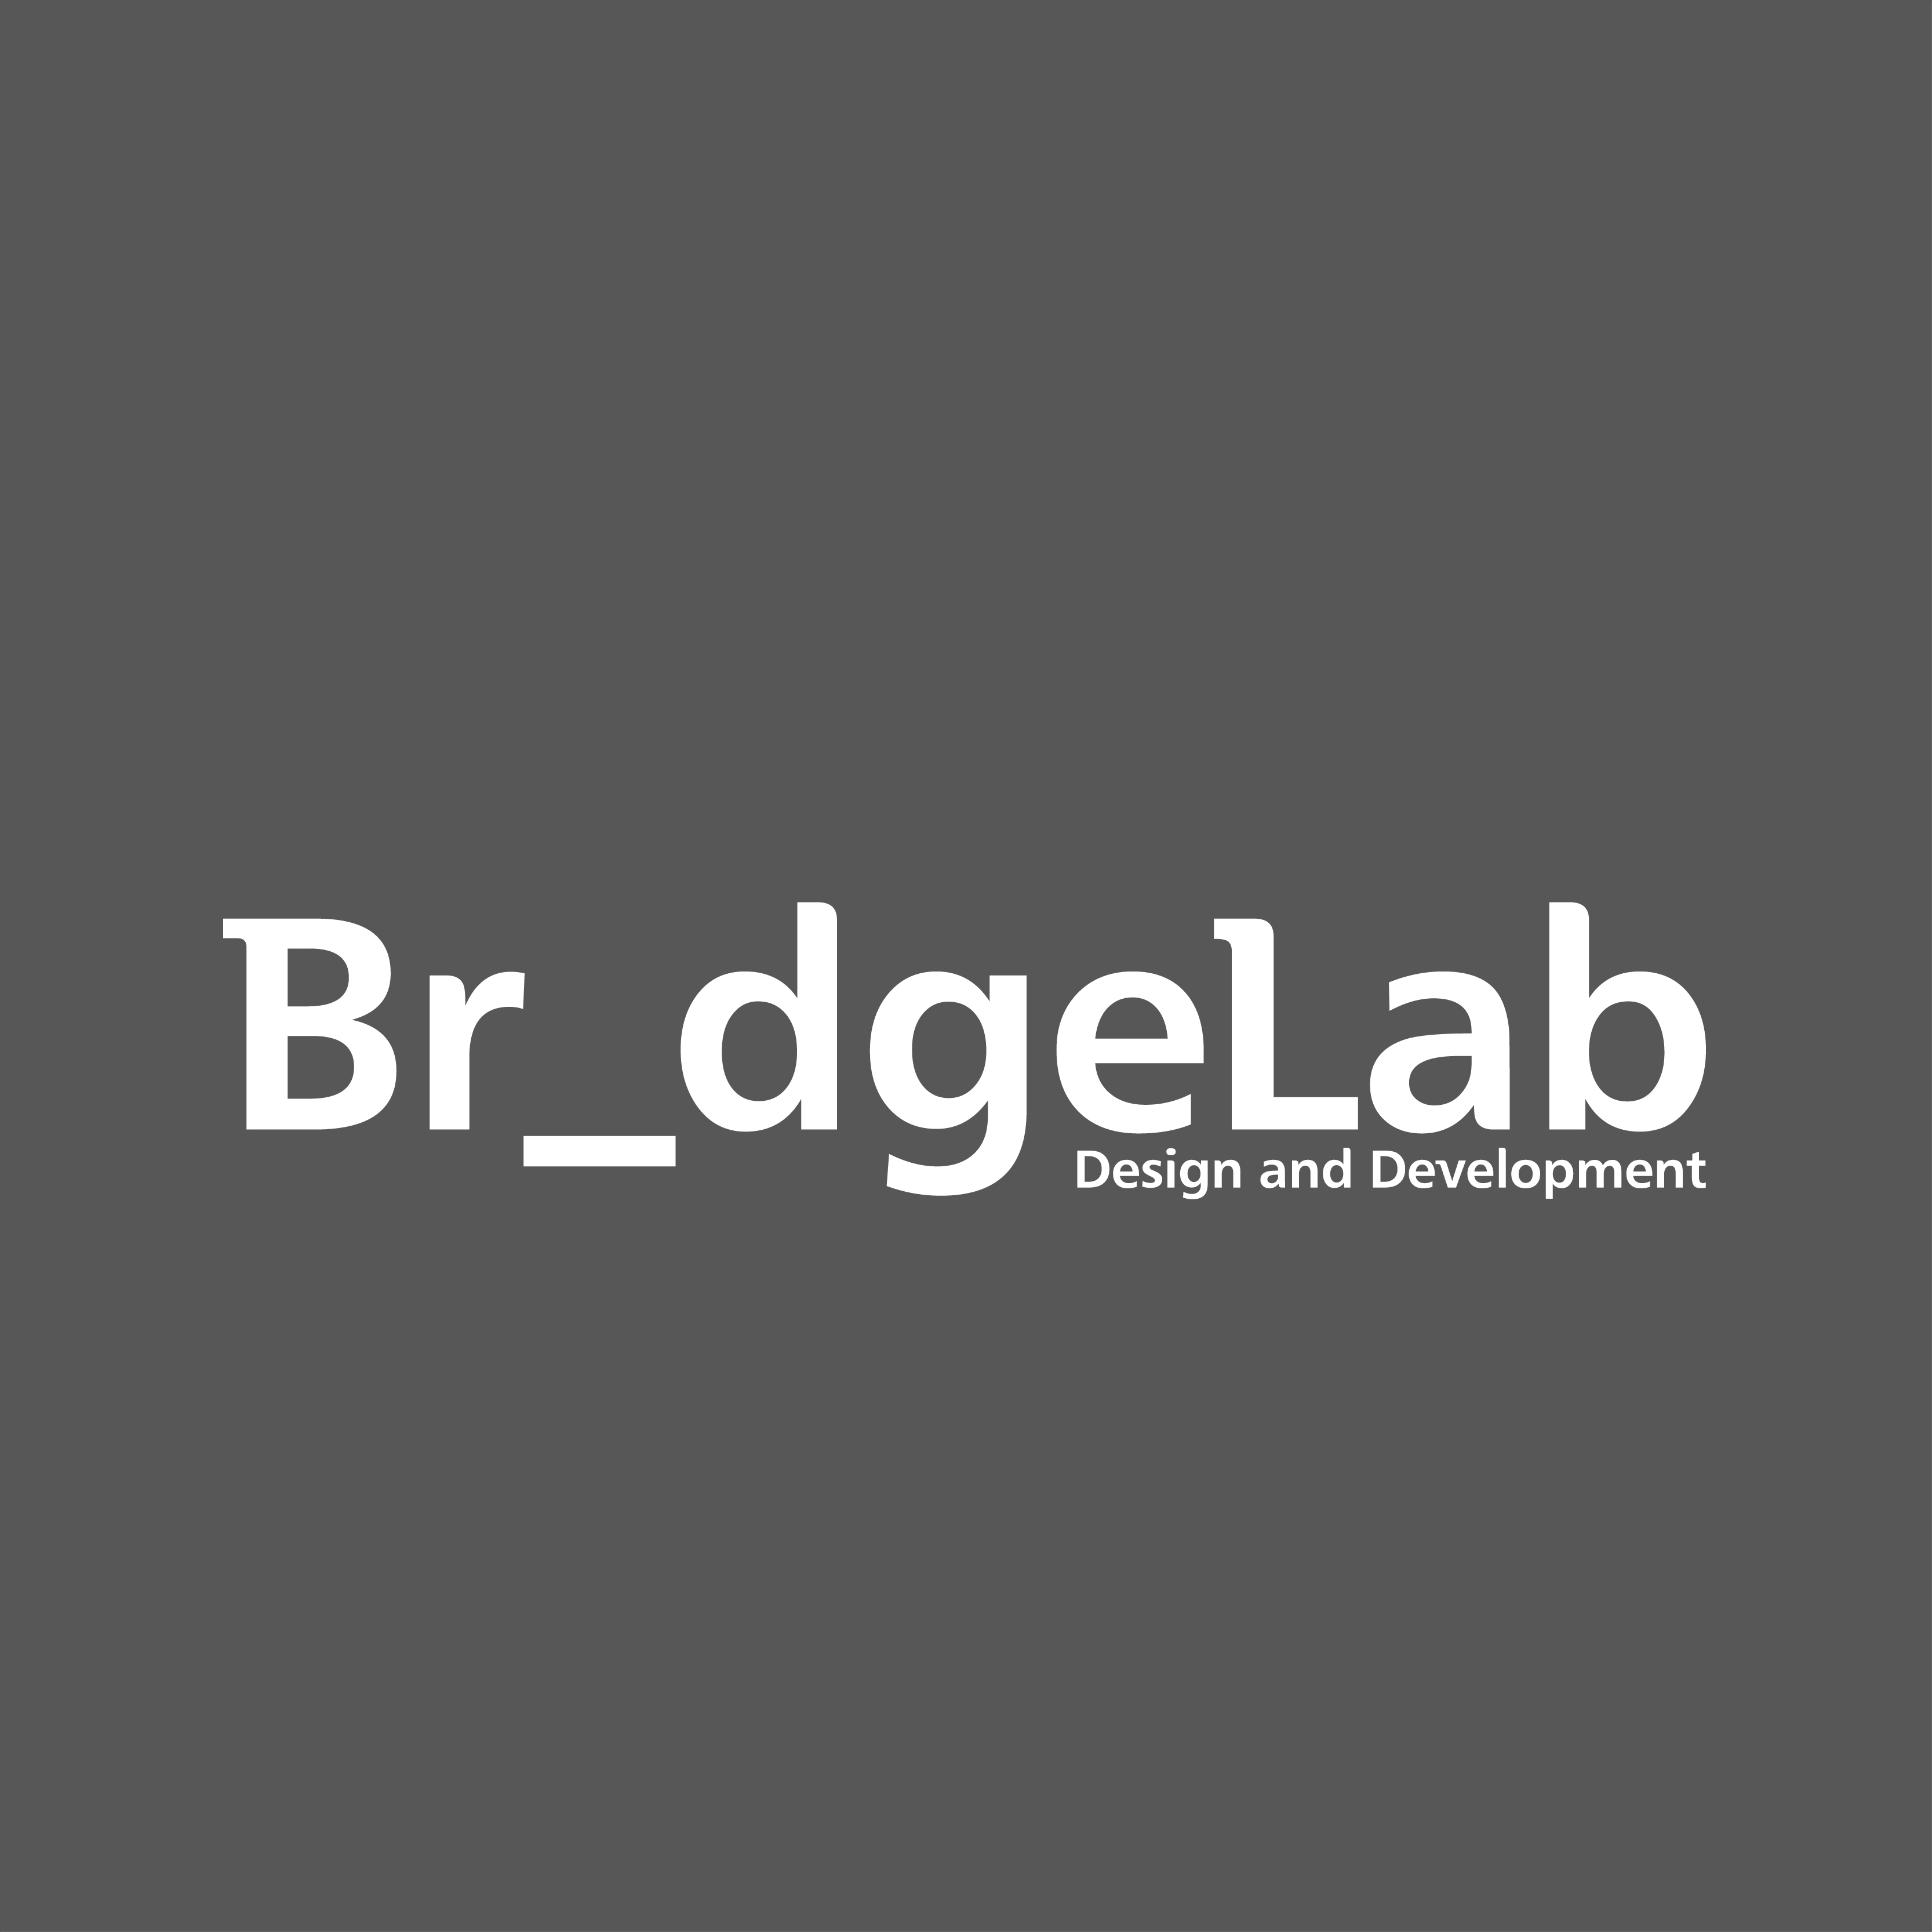 Br_dge_logo.jpg